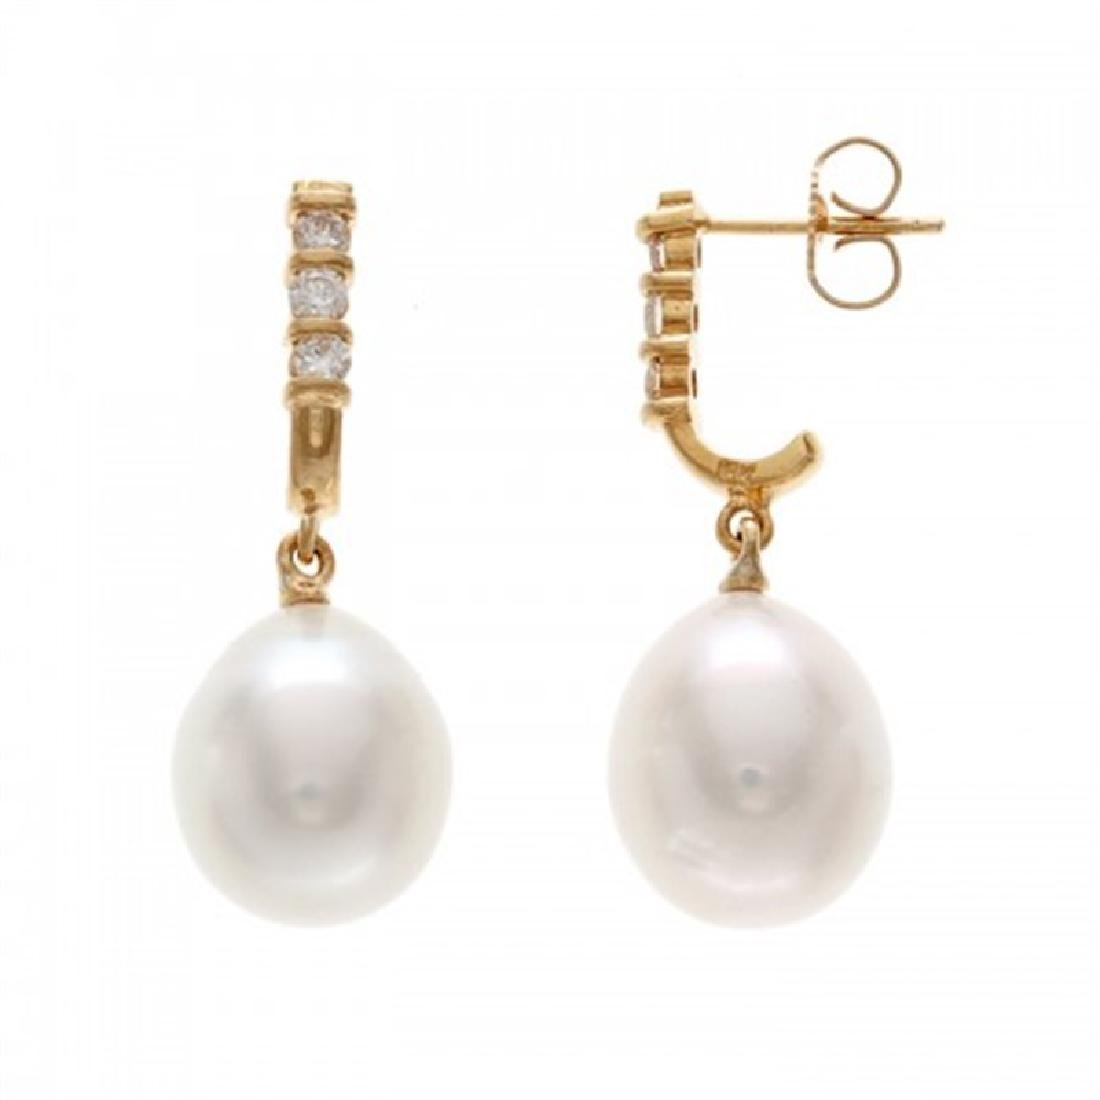 11.0-11.5mm South Sea Earrings with Diamonds